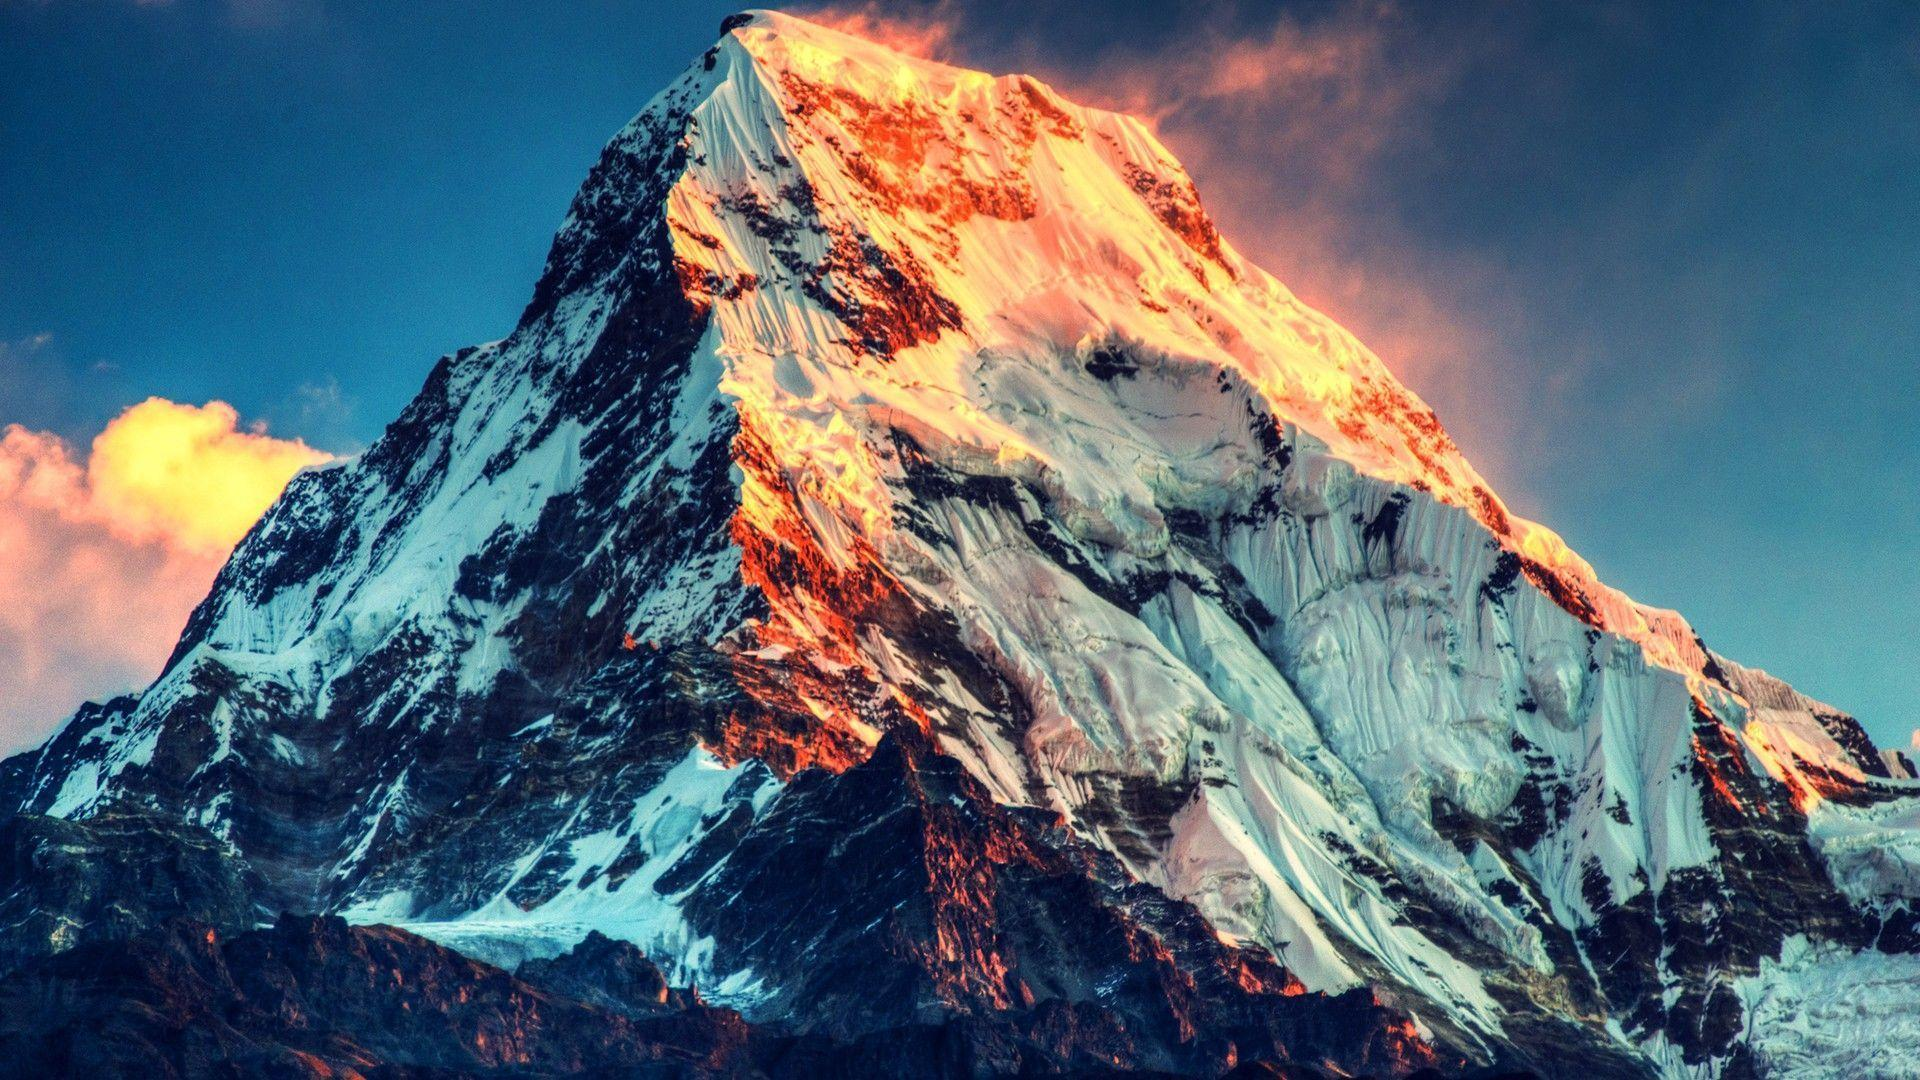 Burning Sunlight Mount Everest HD Wallpaper » FullHDWpp - Full HD ...